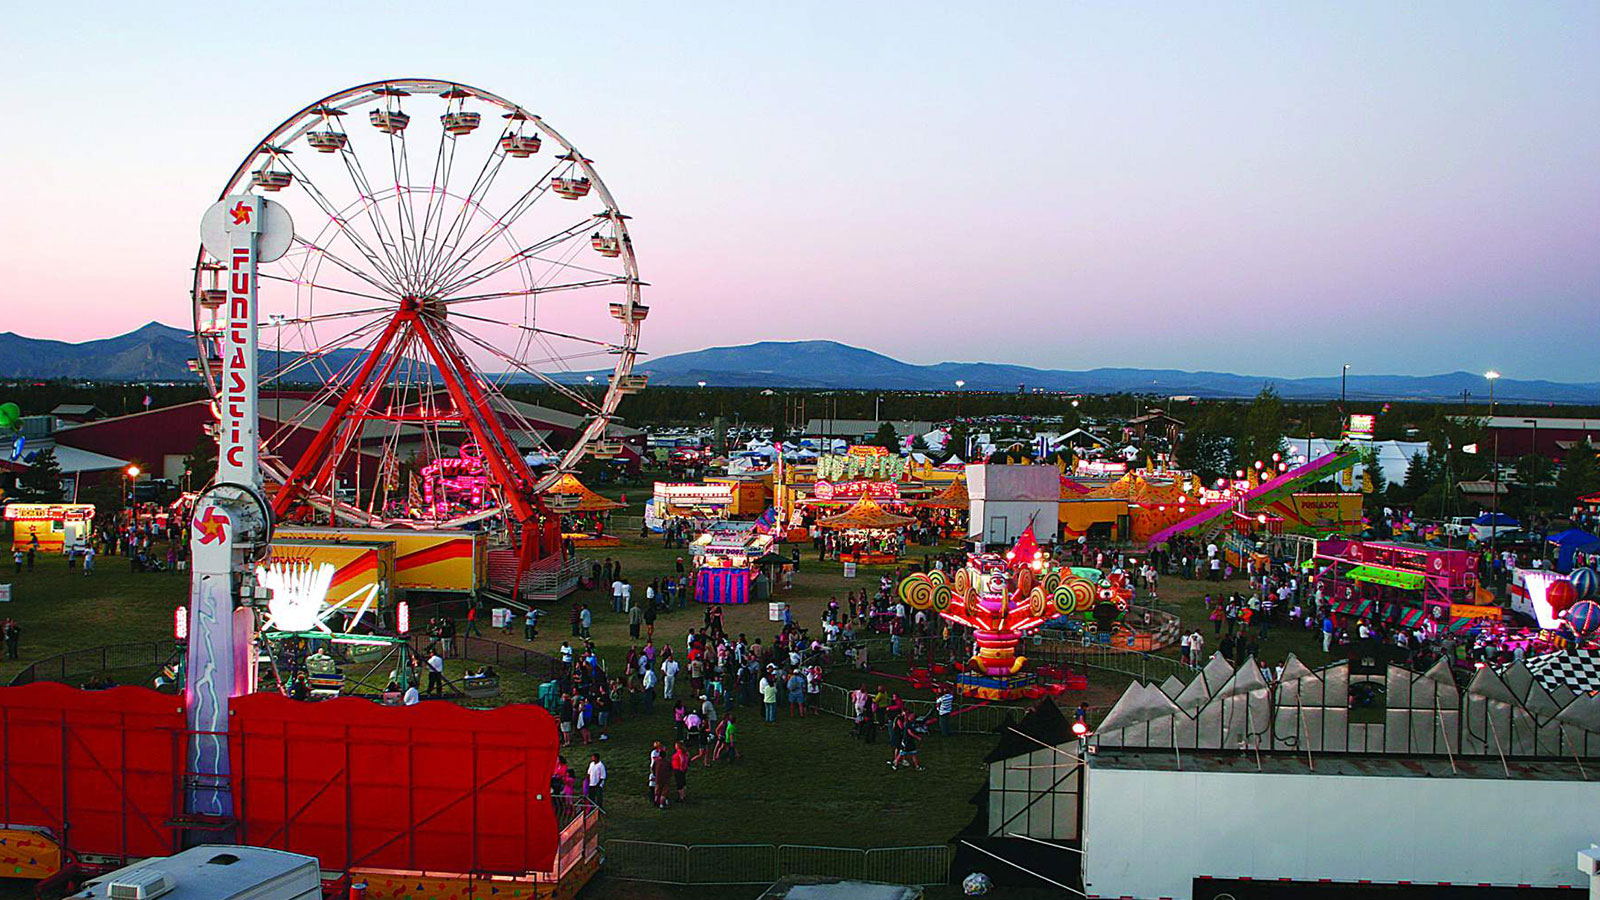 2019 deschutes county fair  u0026 rodeo - 2019-08-02